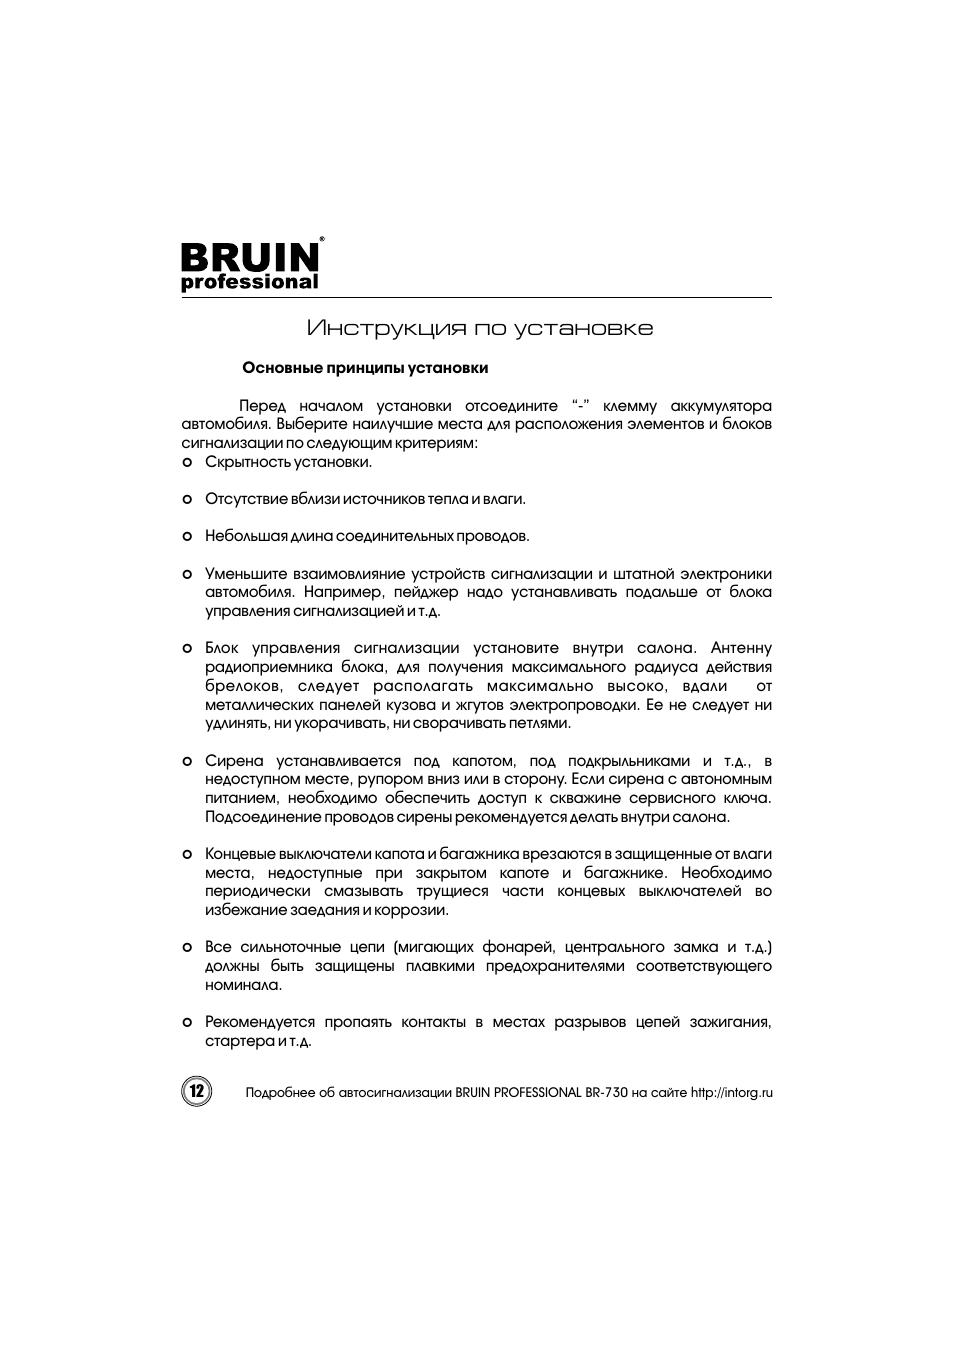 Инструкция по эксплуатации автосигнализации bruin professional